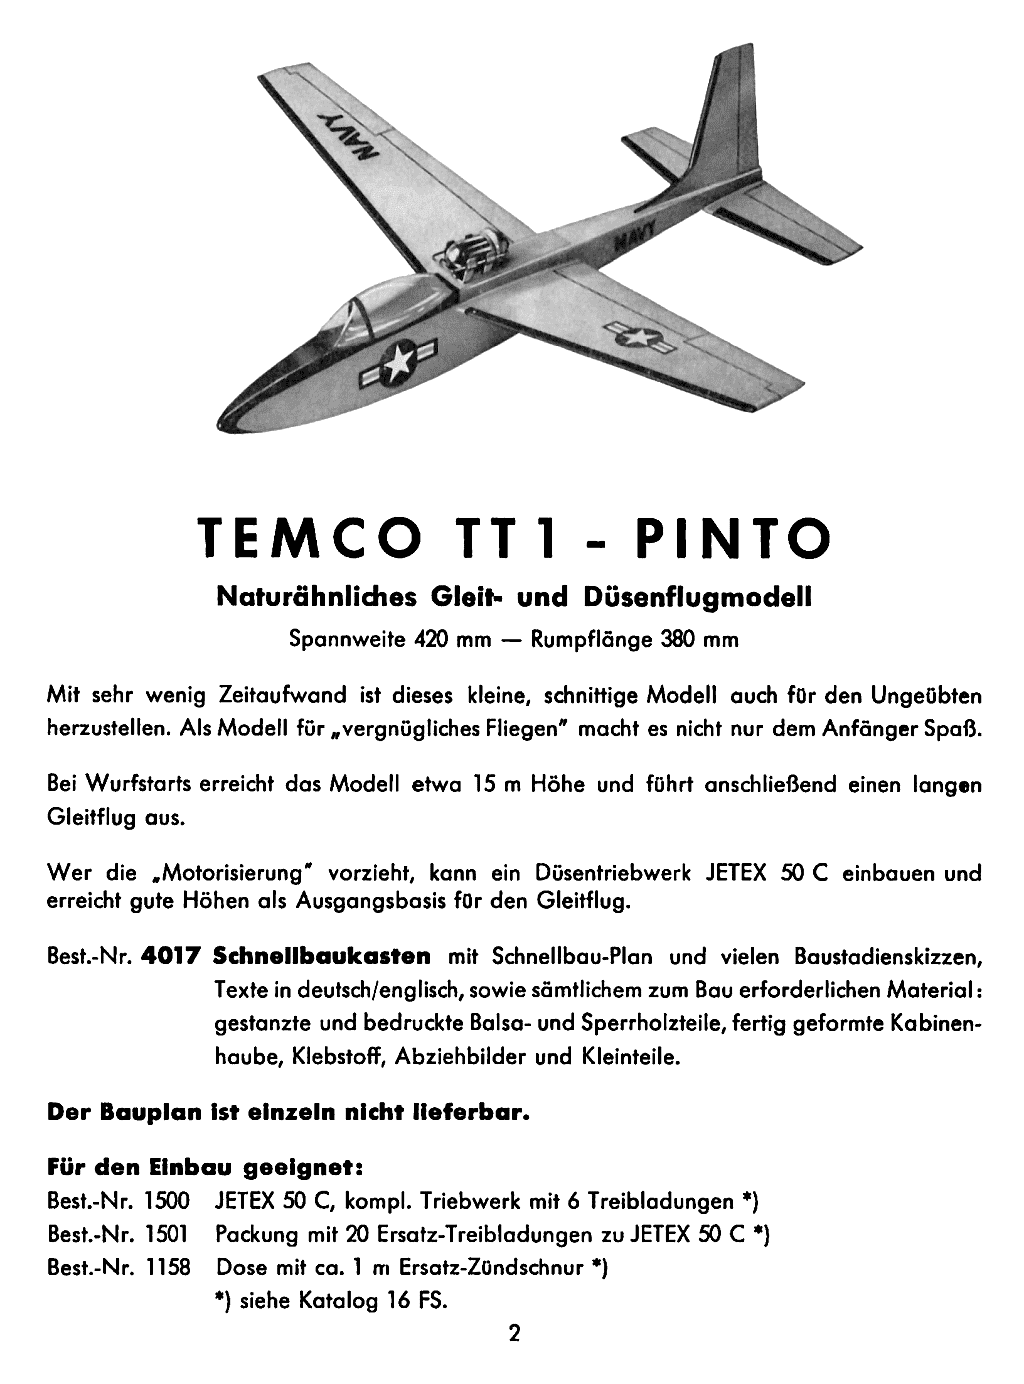 Graupner_N62_Temco_Pinto_k.png